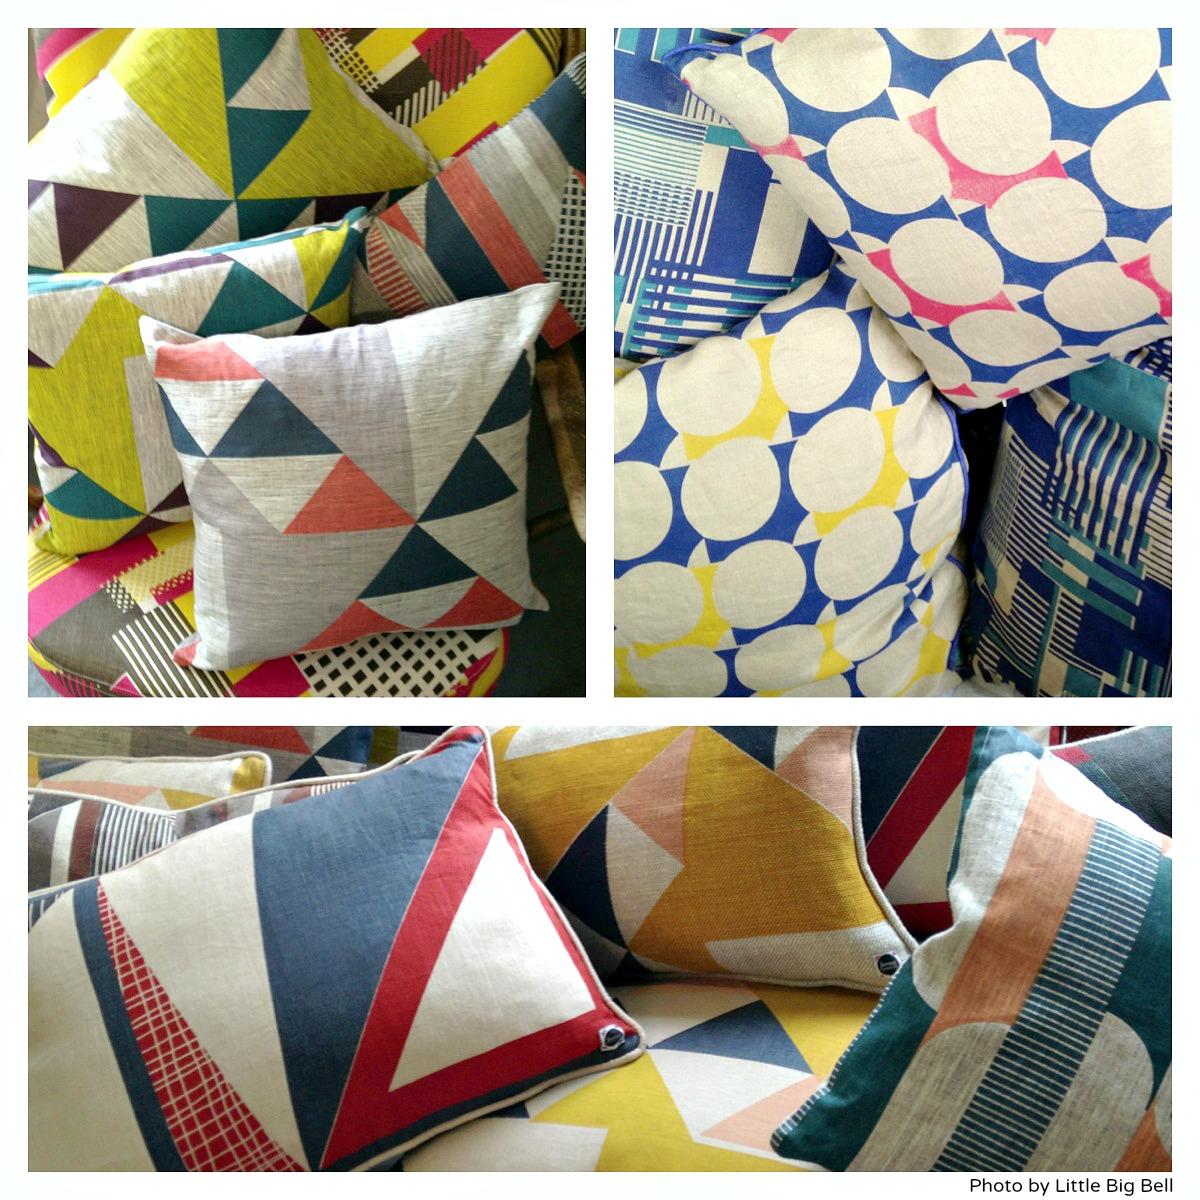 Tamasyn-Gambell-cushions-Little-Big-Bell-blog